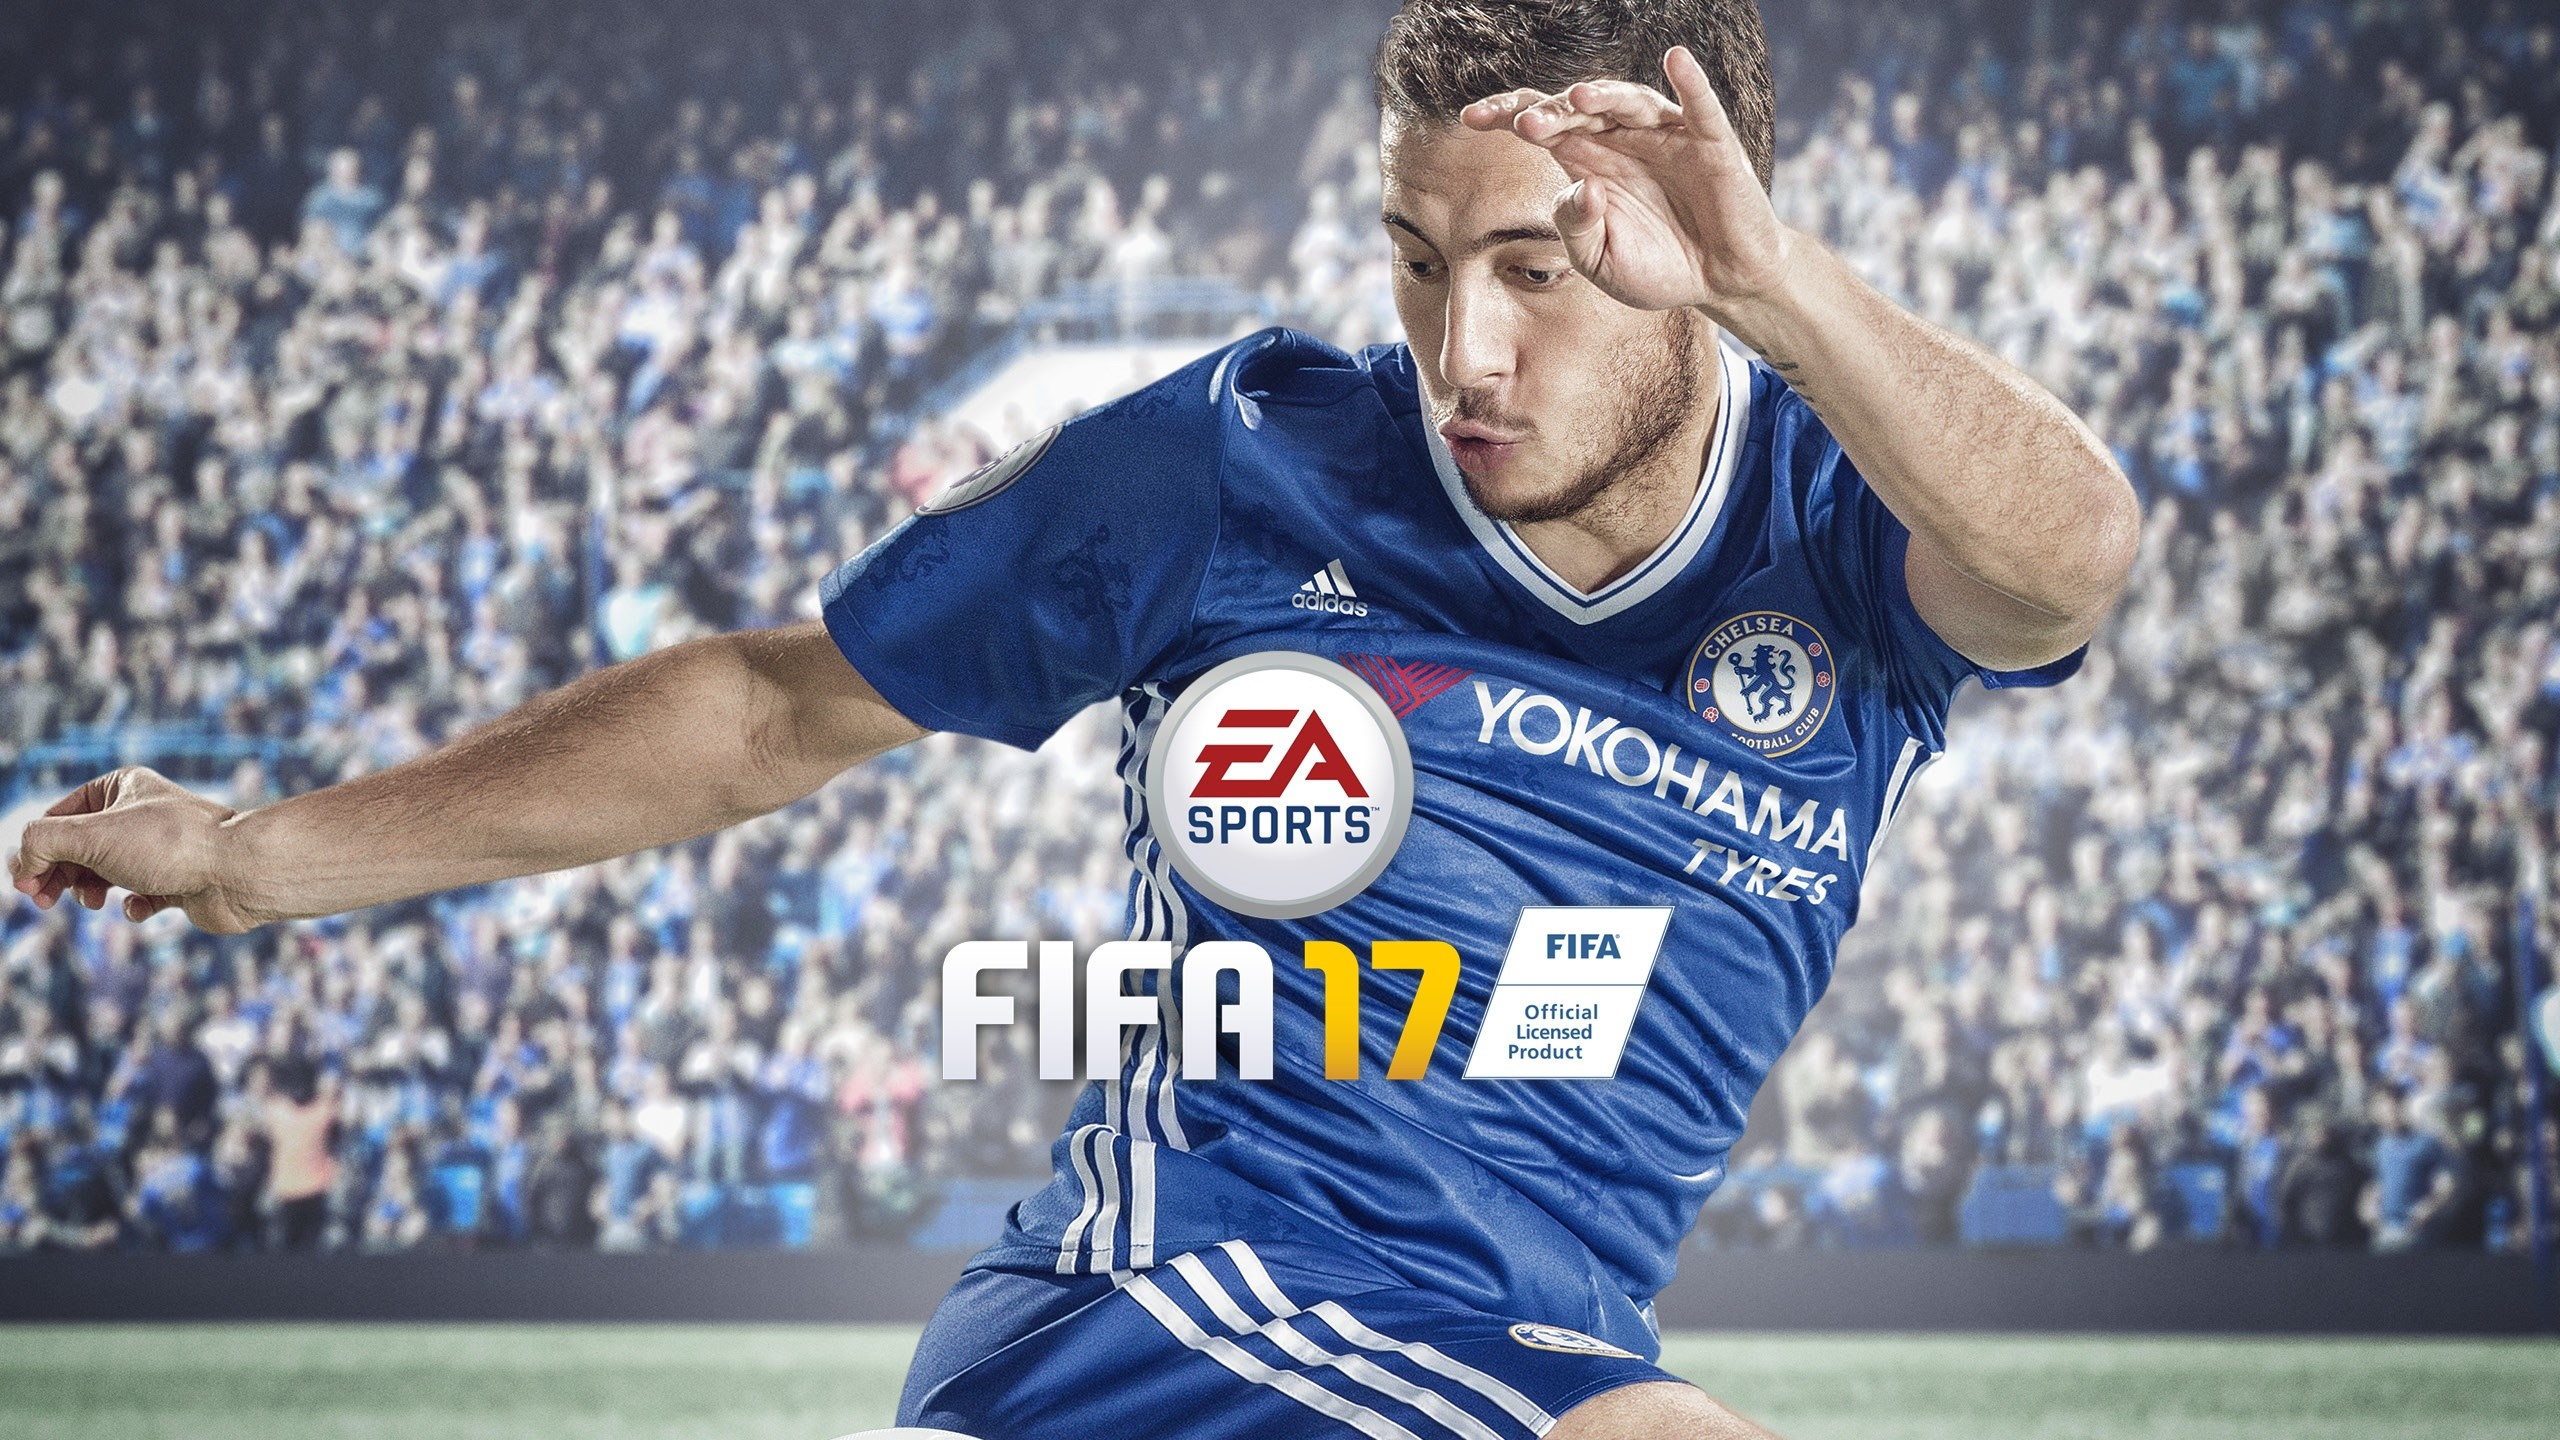 Wallpaper Eden Hazard in Fifa 17